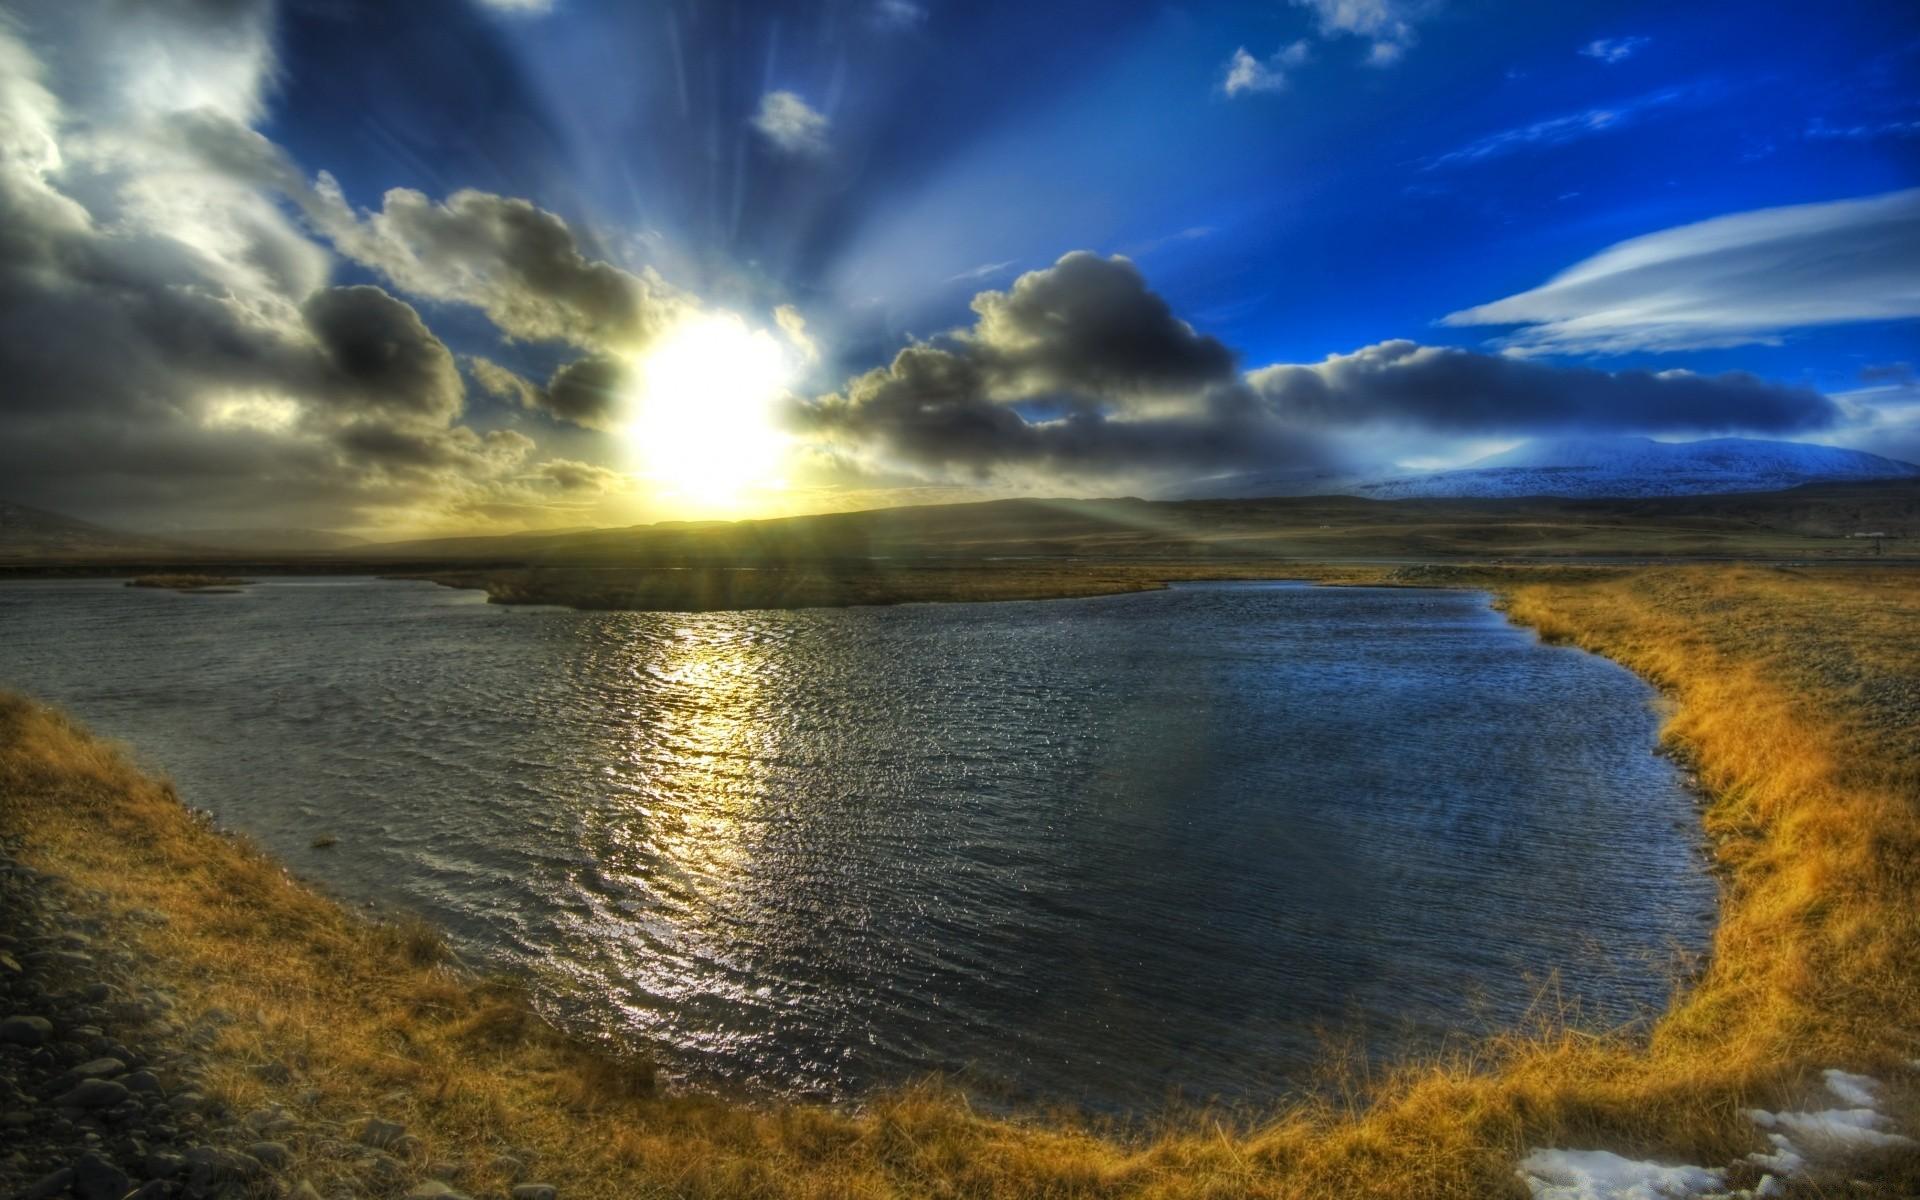 Europe Water Sunset Landscape Reflection Dawn Evening - Landscape Images 1200 Pixel - HD Wallpaper